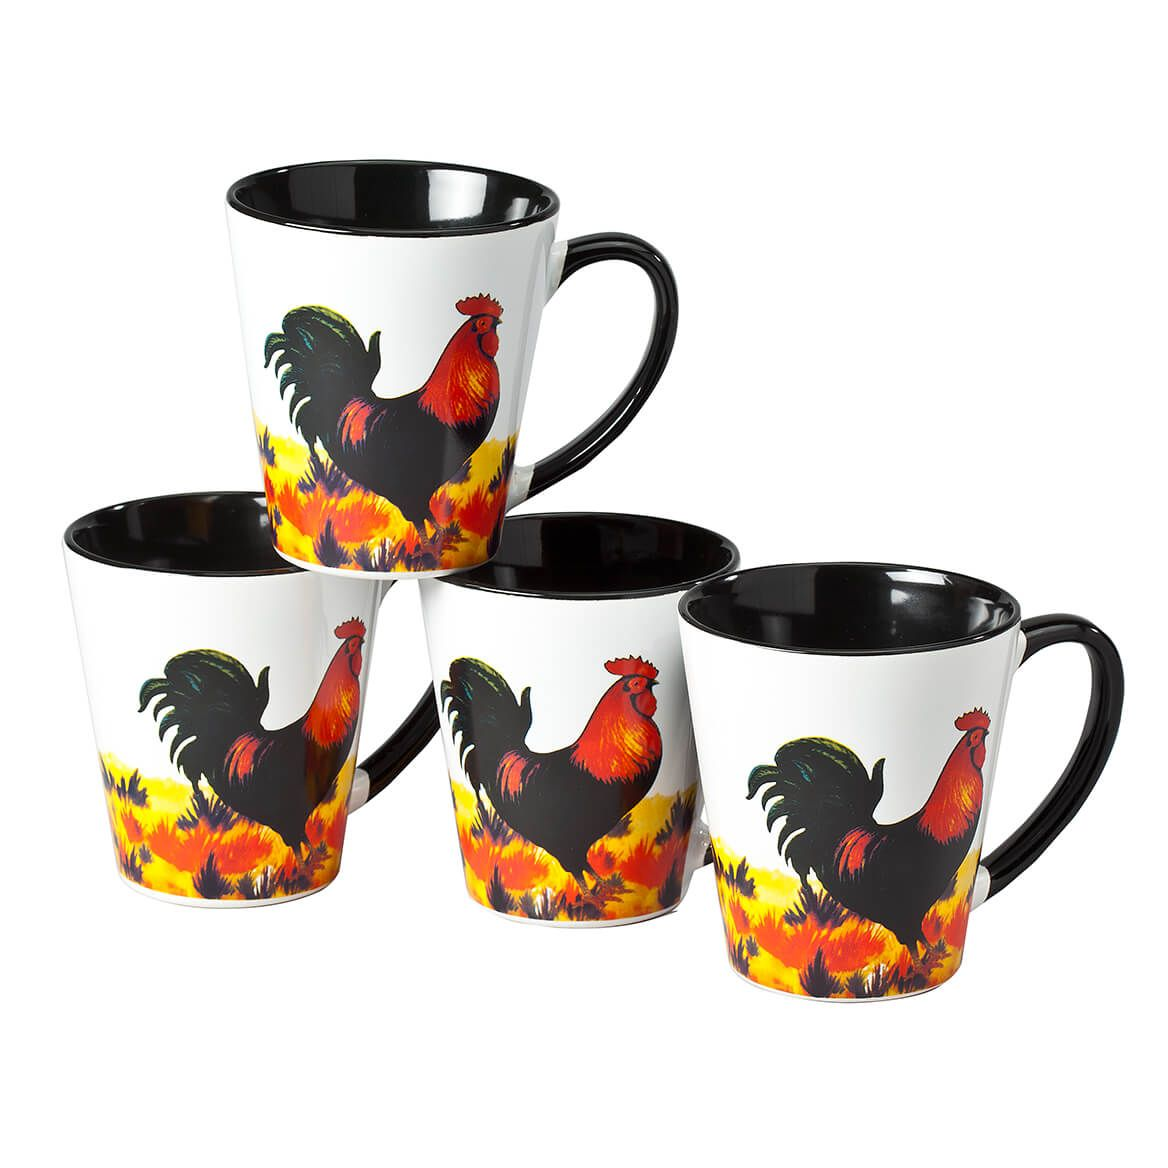 8 oz Rooster Mugs Set of 4-361968